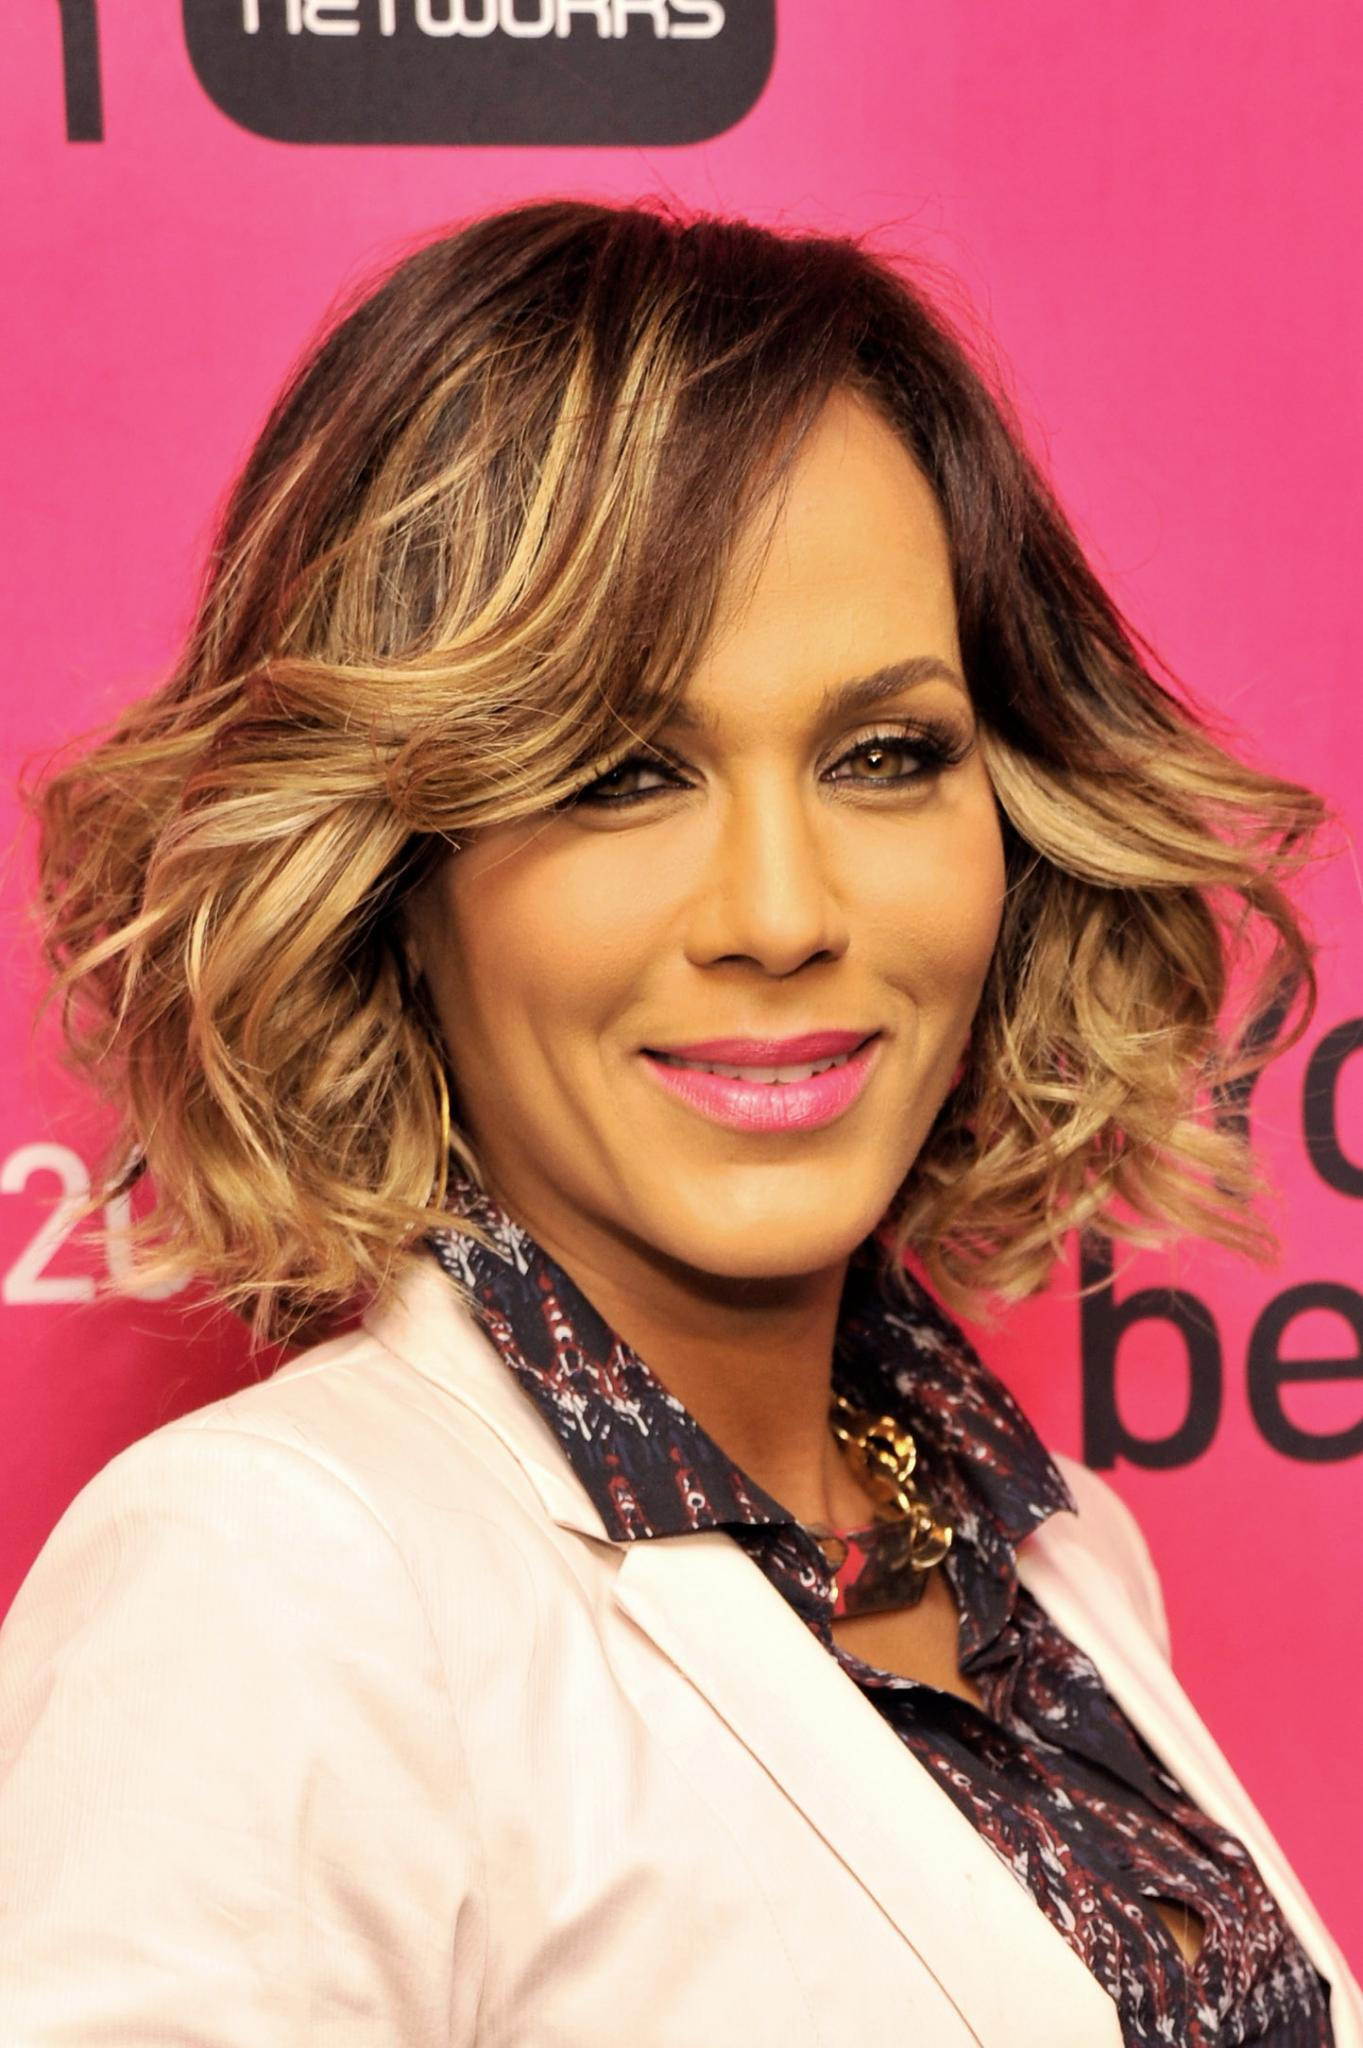 Nicole Ari Parker Lands Permanent Spot on Radio Show